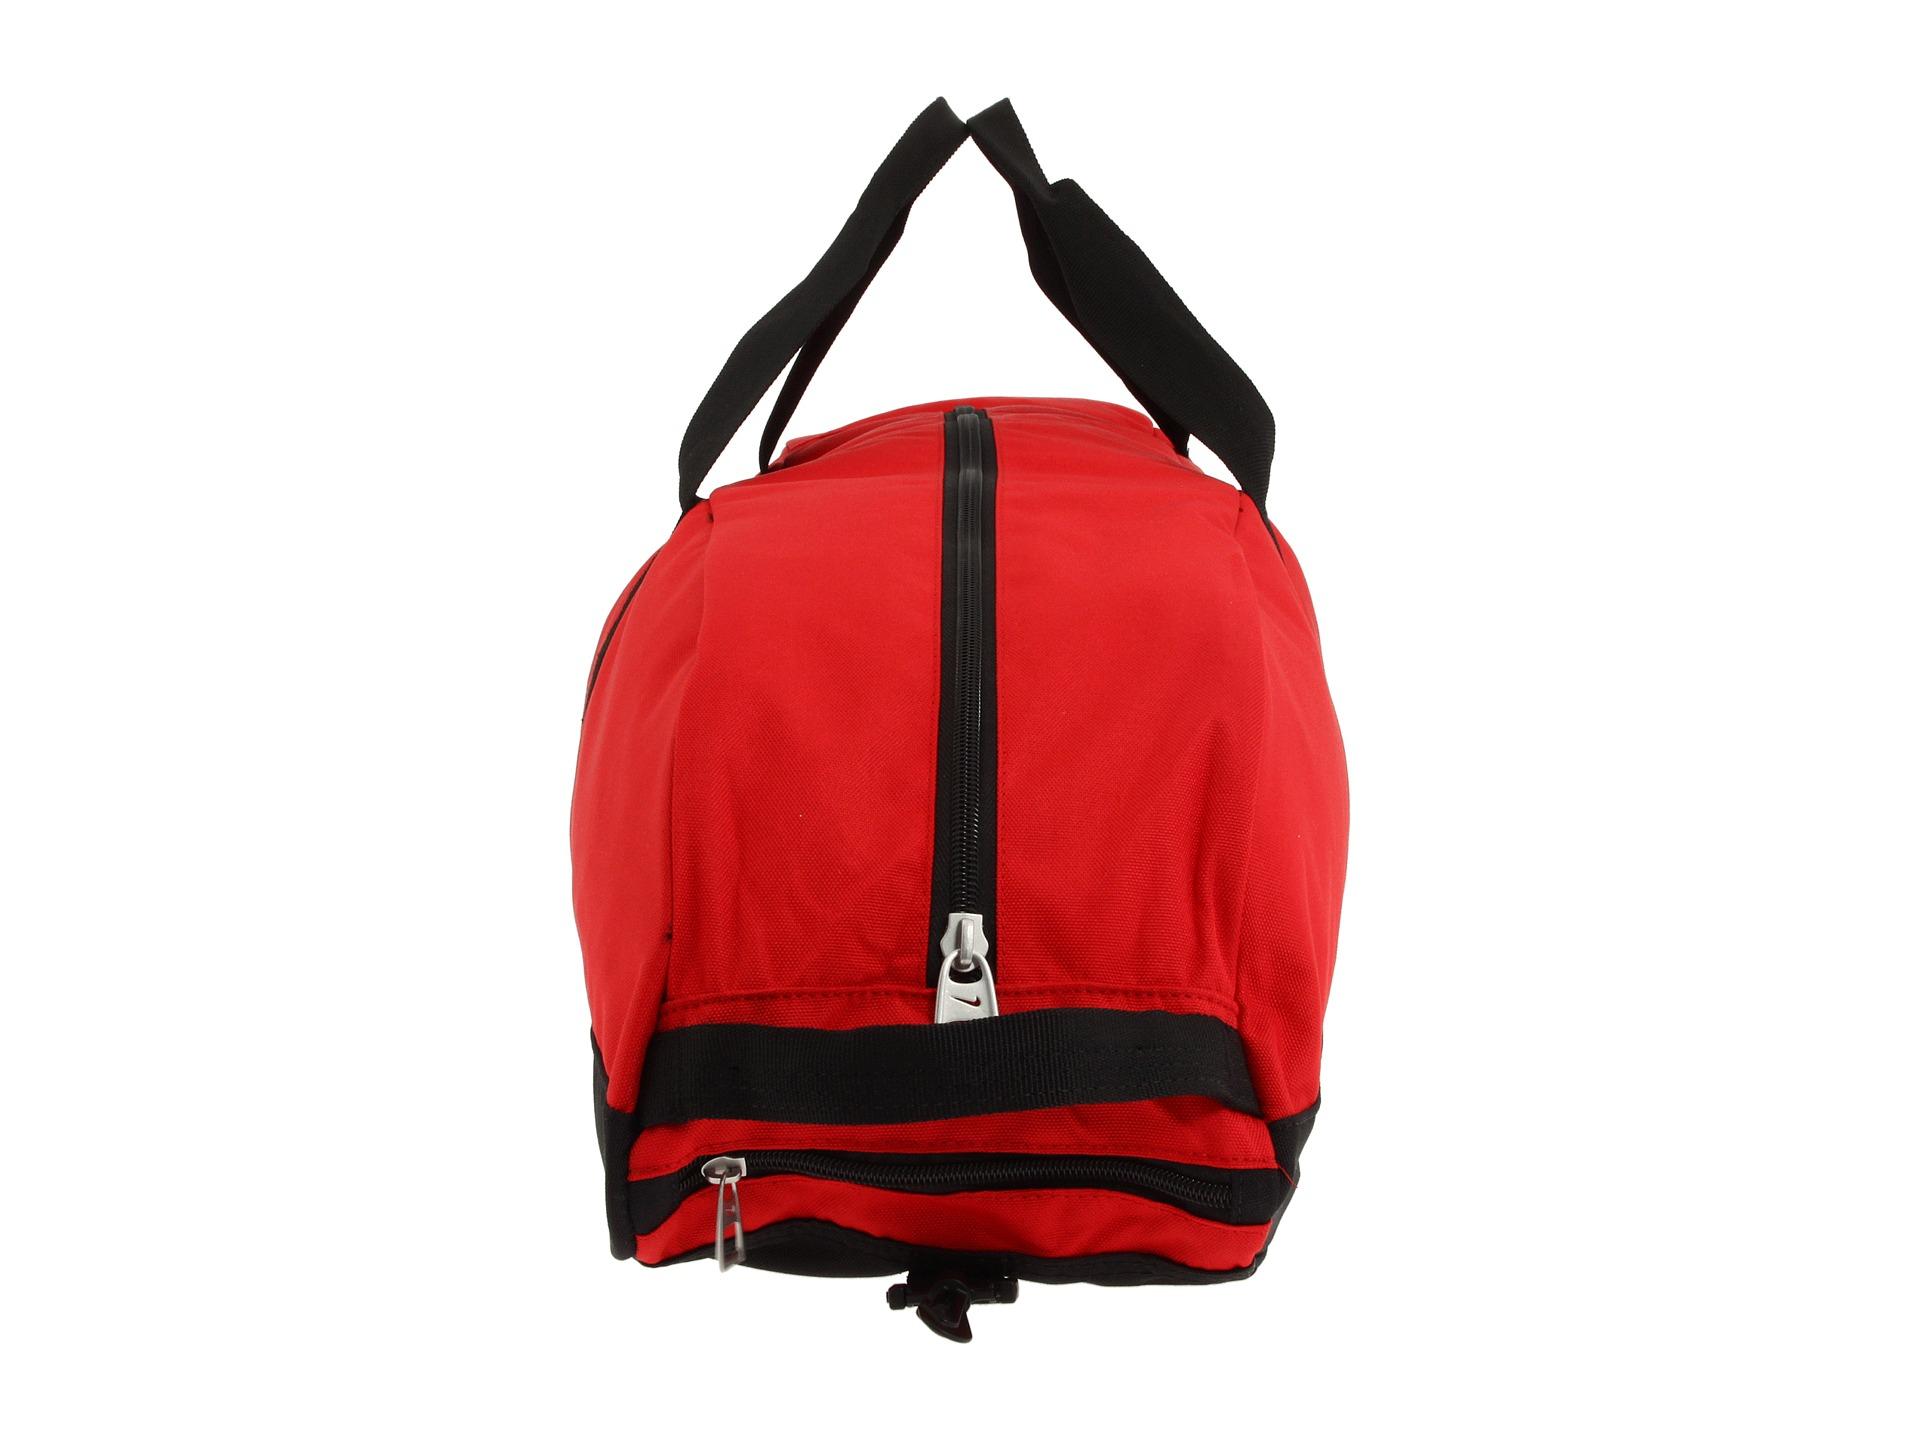 Nike Keystone Baseball Duffel Bag - Large in Red (Varsity ...